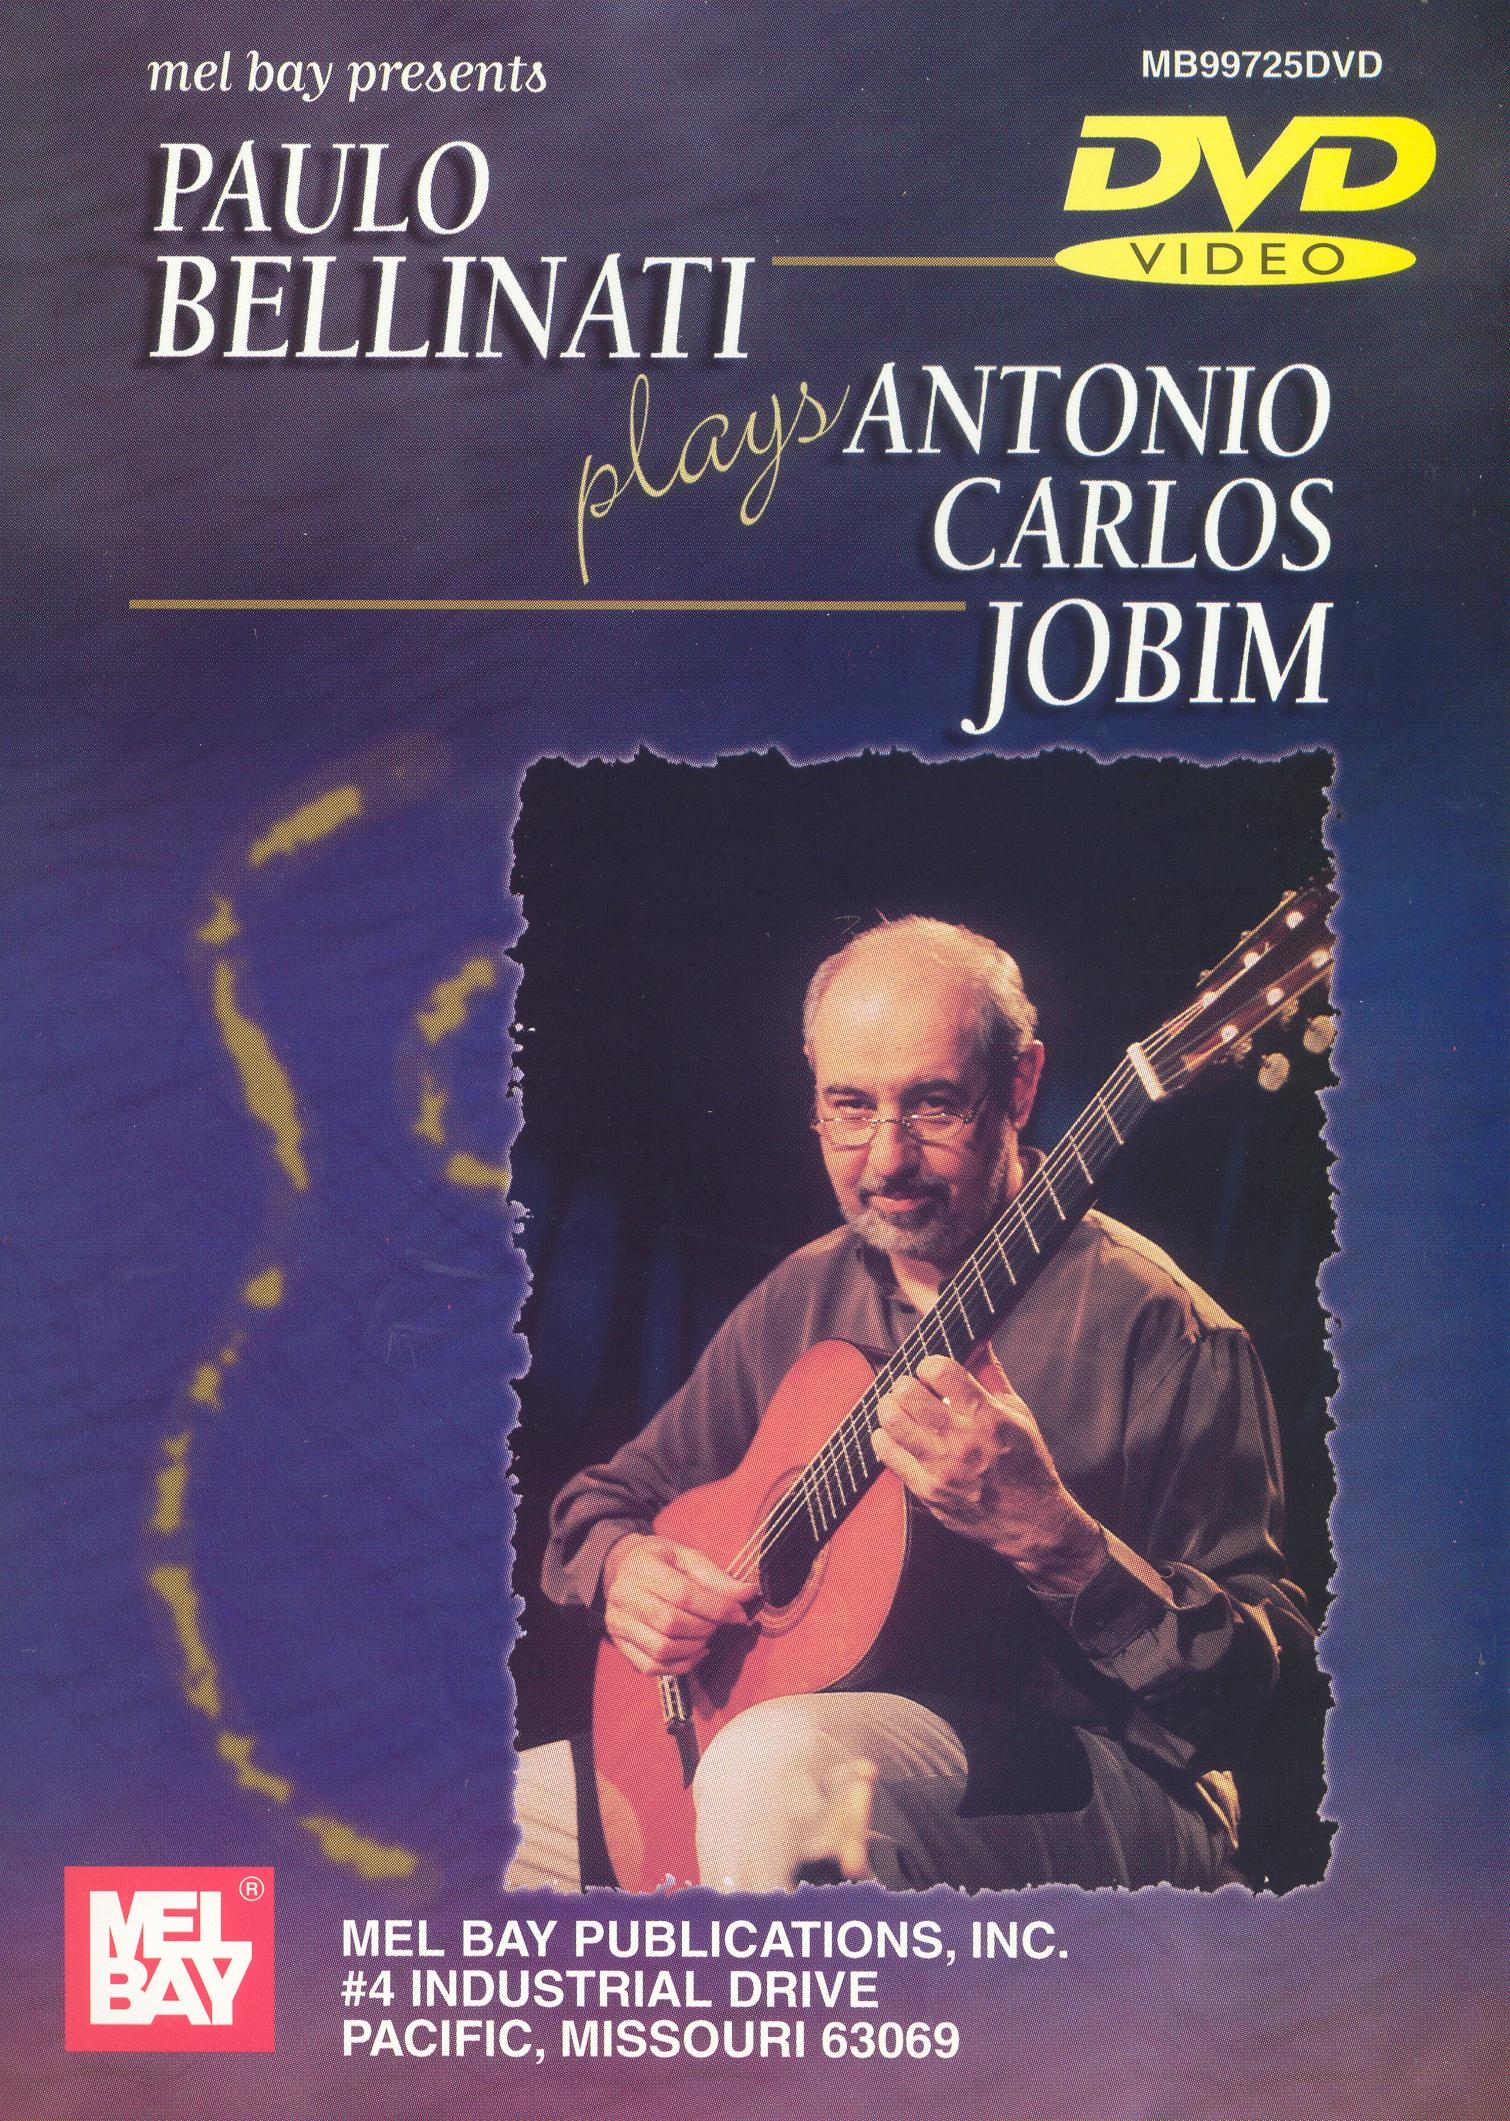 Paulo Bellinati: Paulo Bellinati Plays Antonio Carlos Jobim